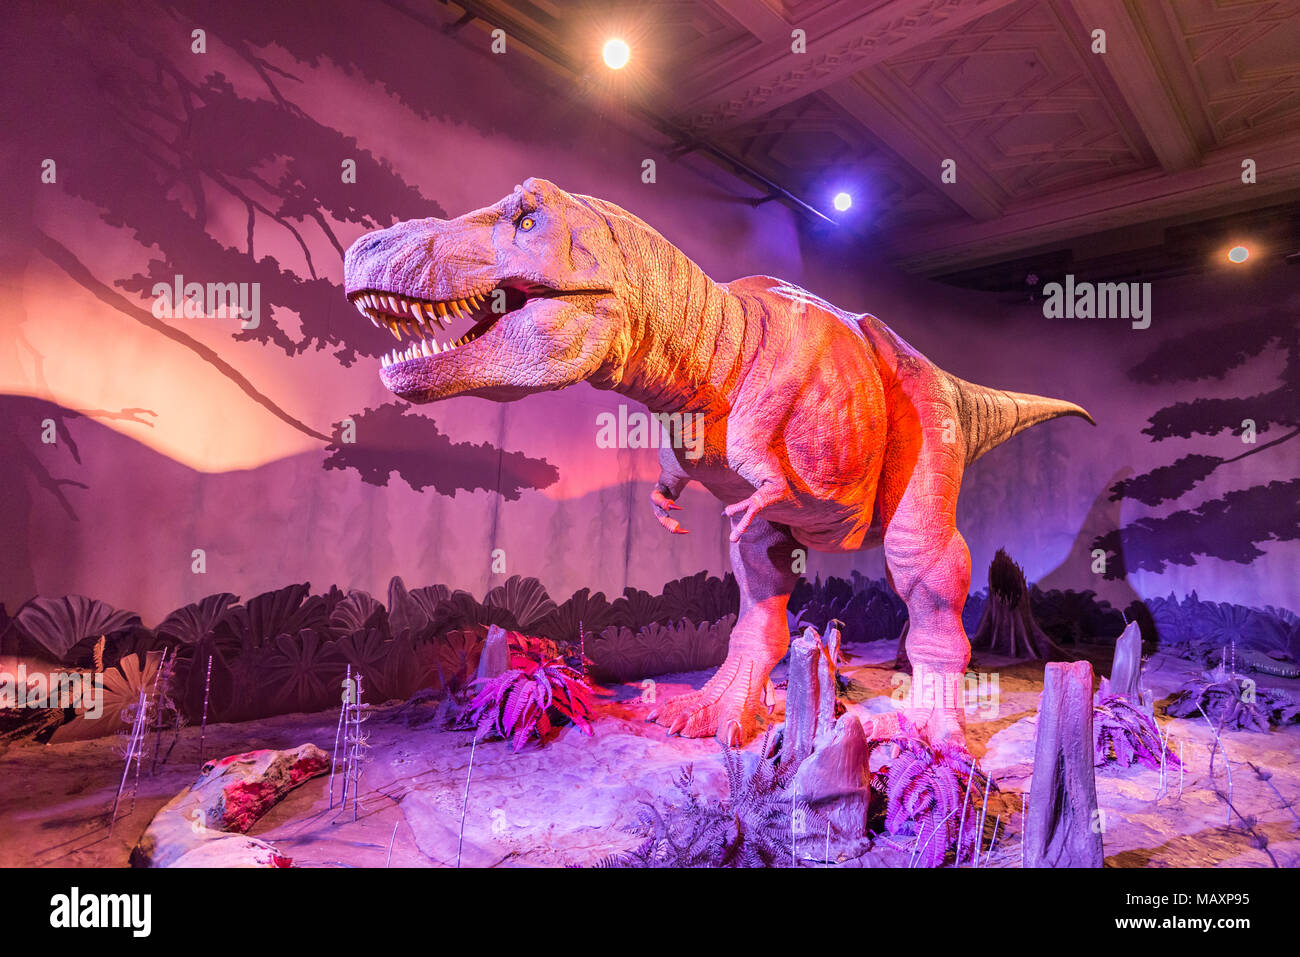 Animatronic model of a Tyrannosaurus rex dinosaur at the Natural History Museum, London, UK - Stock Image